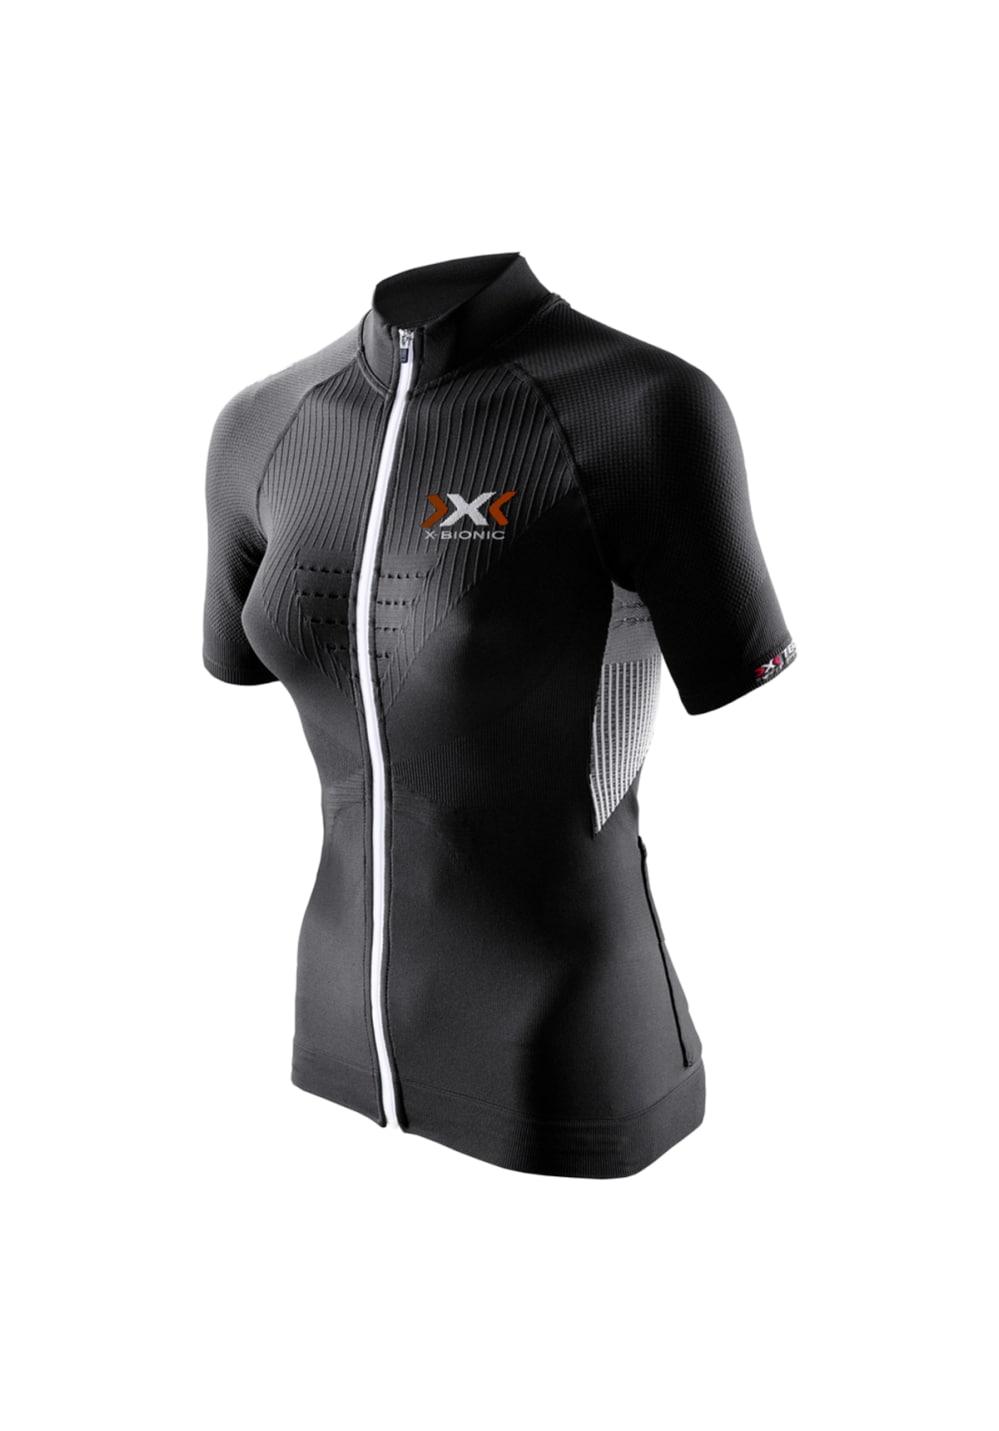 X-Bionic Biking The Trick Shirt Short SleevesFull Zip - Radtrikots für Damen -